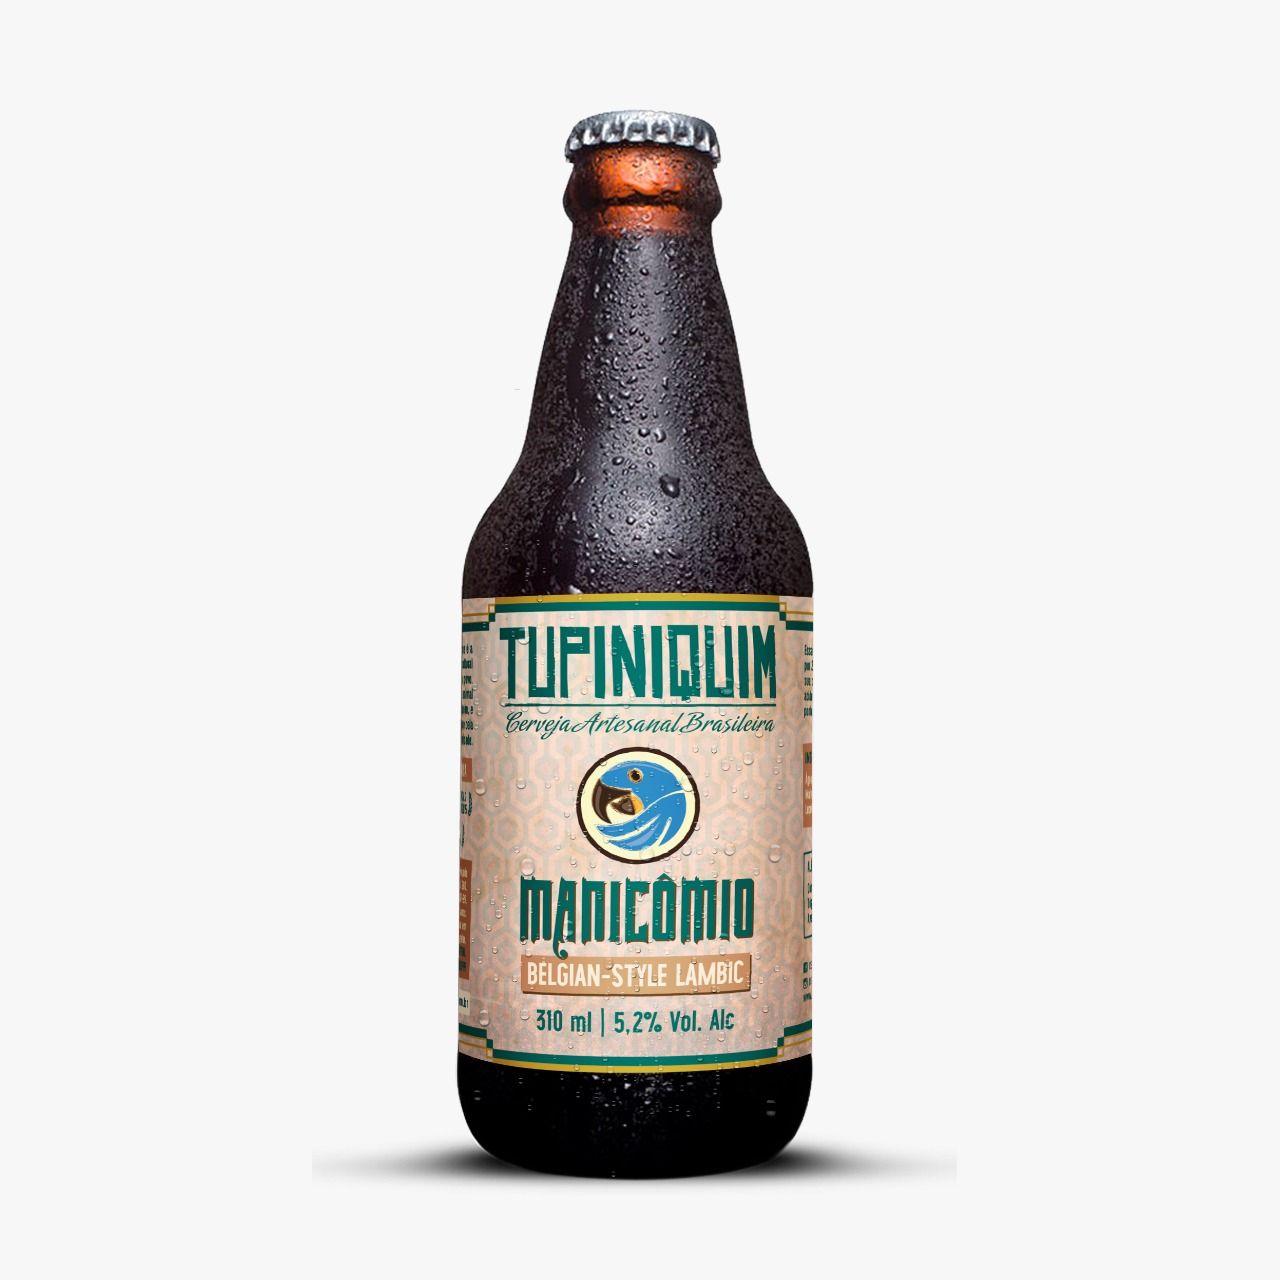 Tupiniquim Manicômio 310ml Lambic